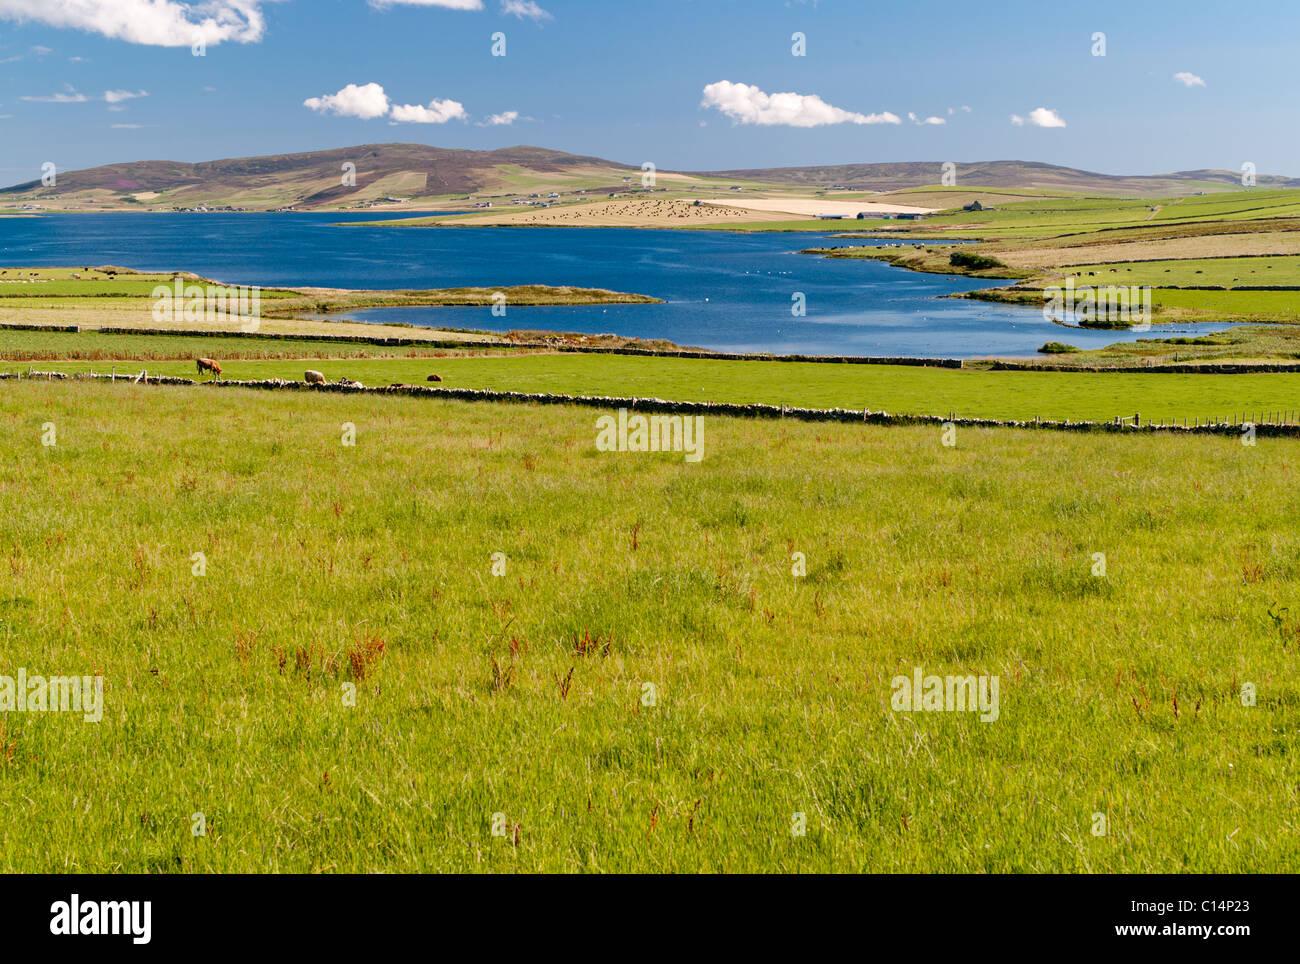 ORKNEY ISLANDS SCOTLAND UNITED KINGDOM - Stock Image